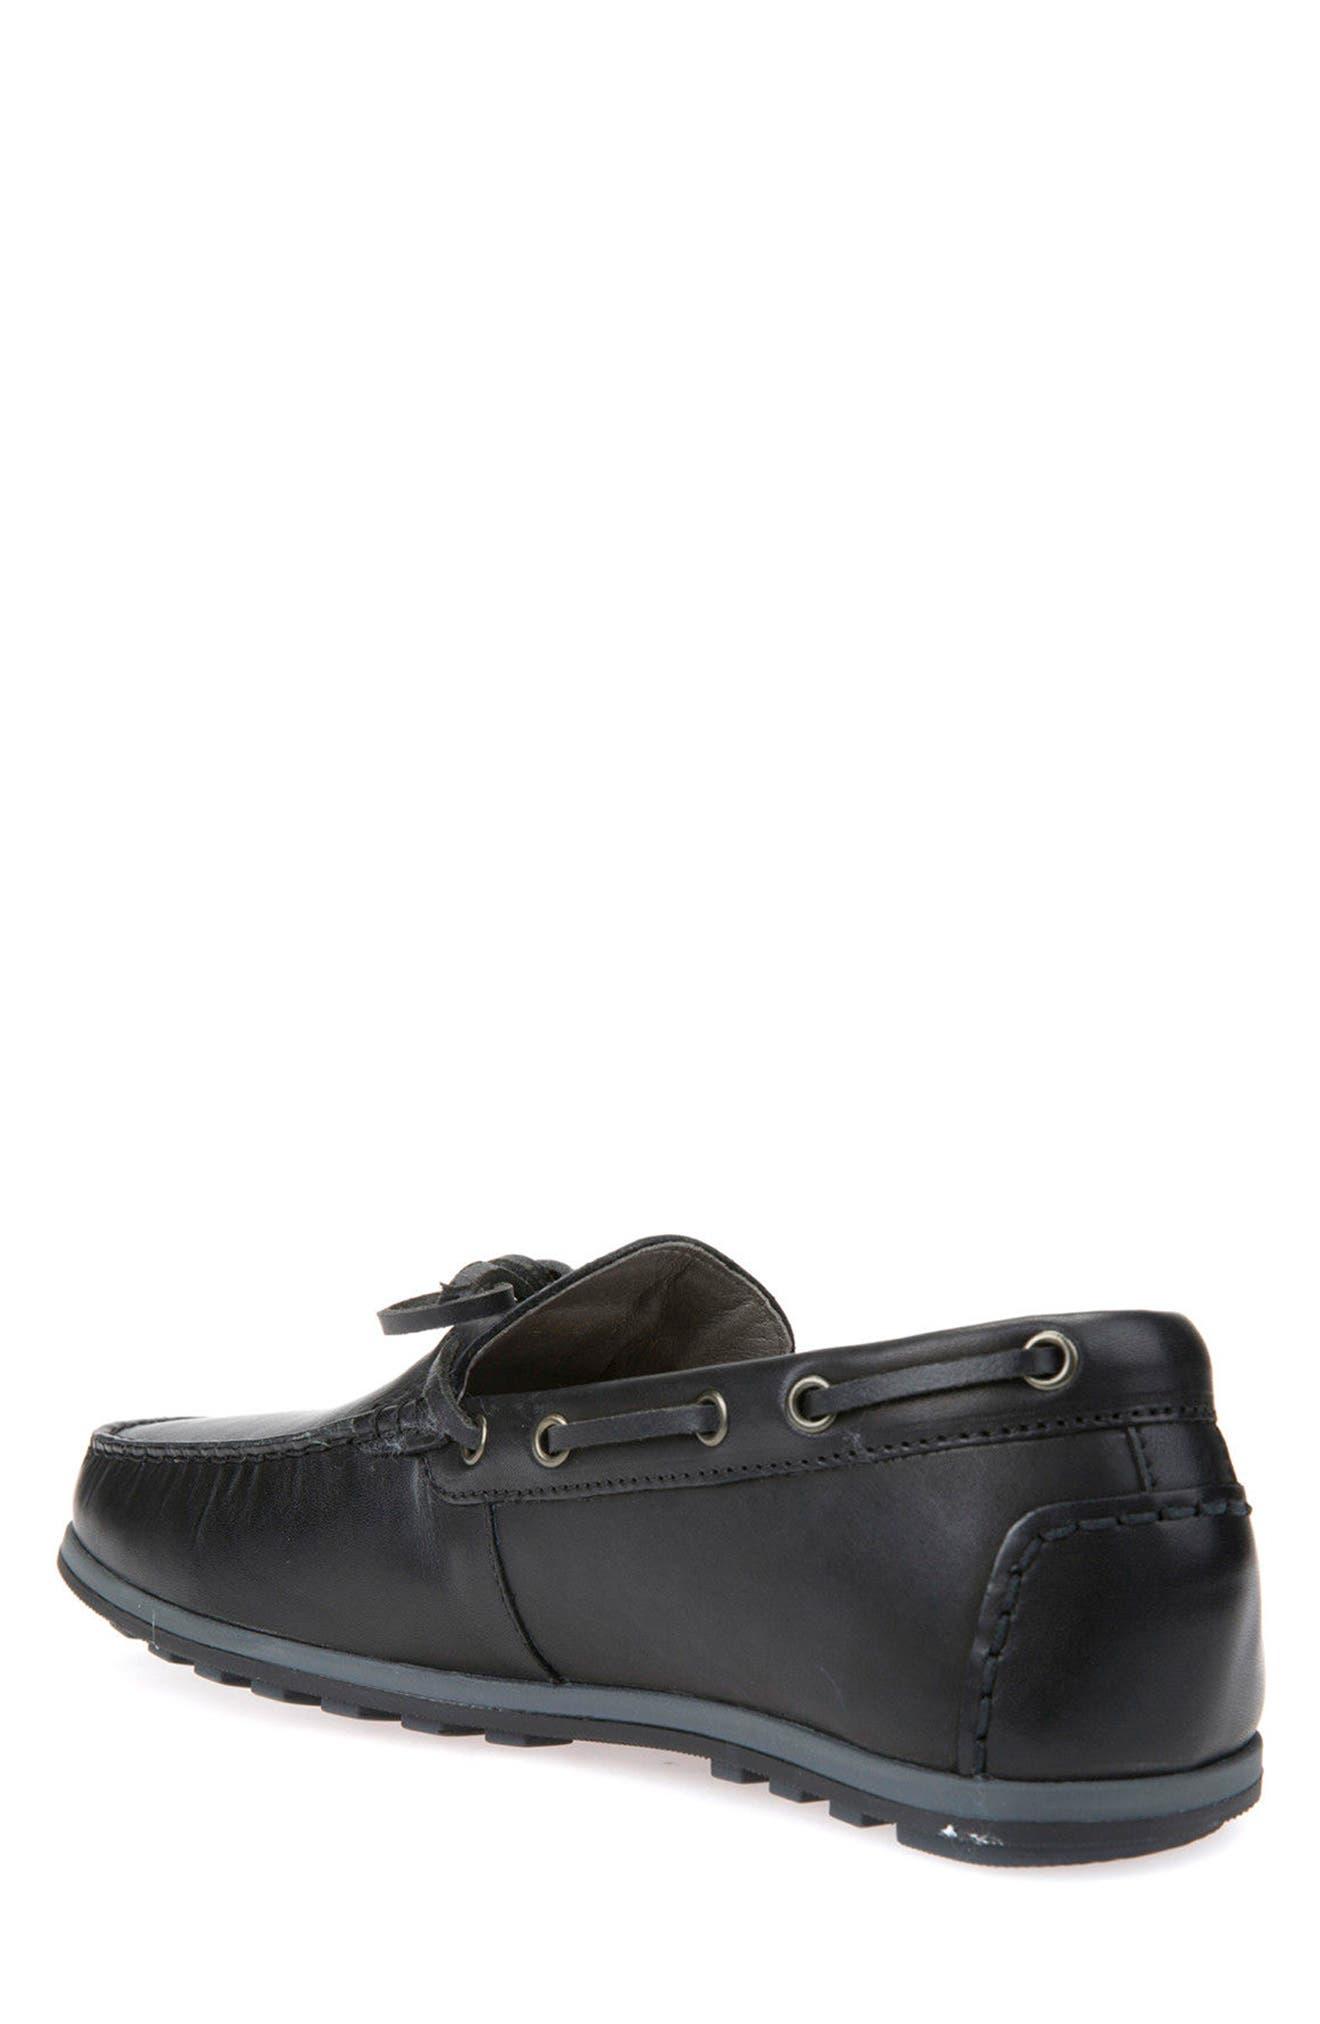 Alternate Image 2  - Geox Mirvin 3 Boat Shoe (Men)